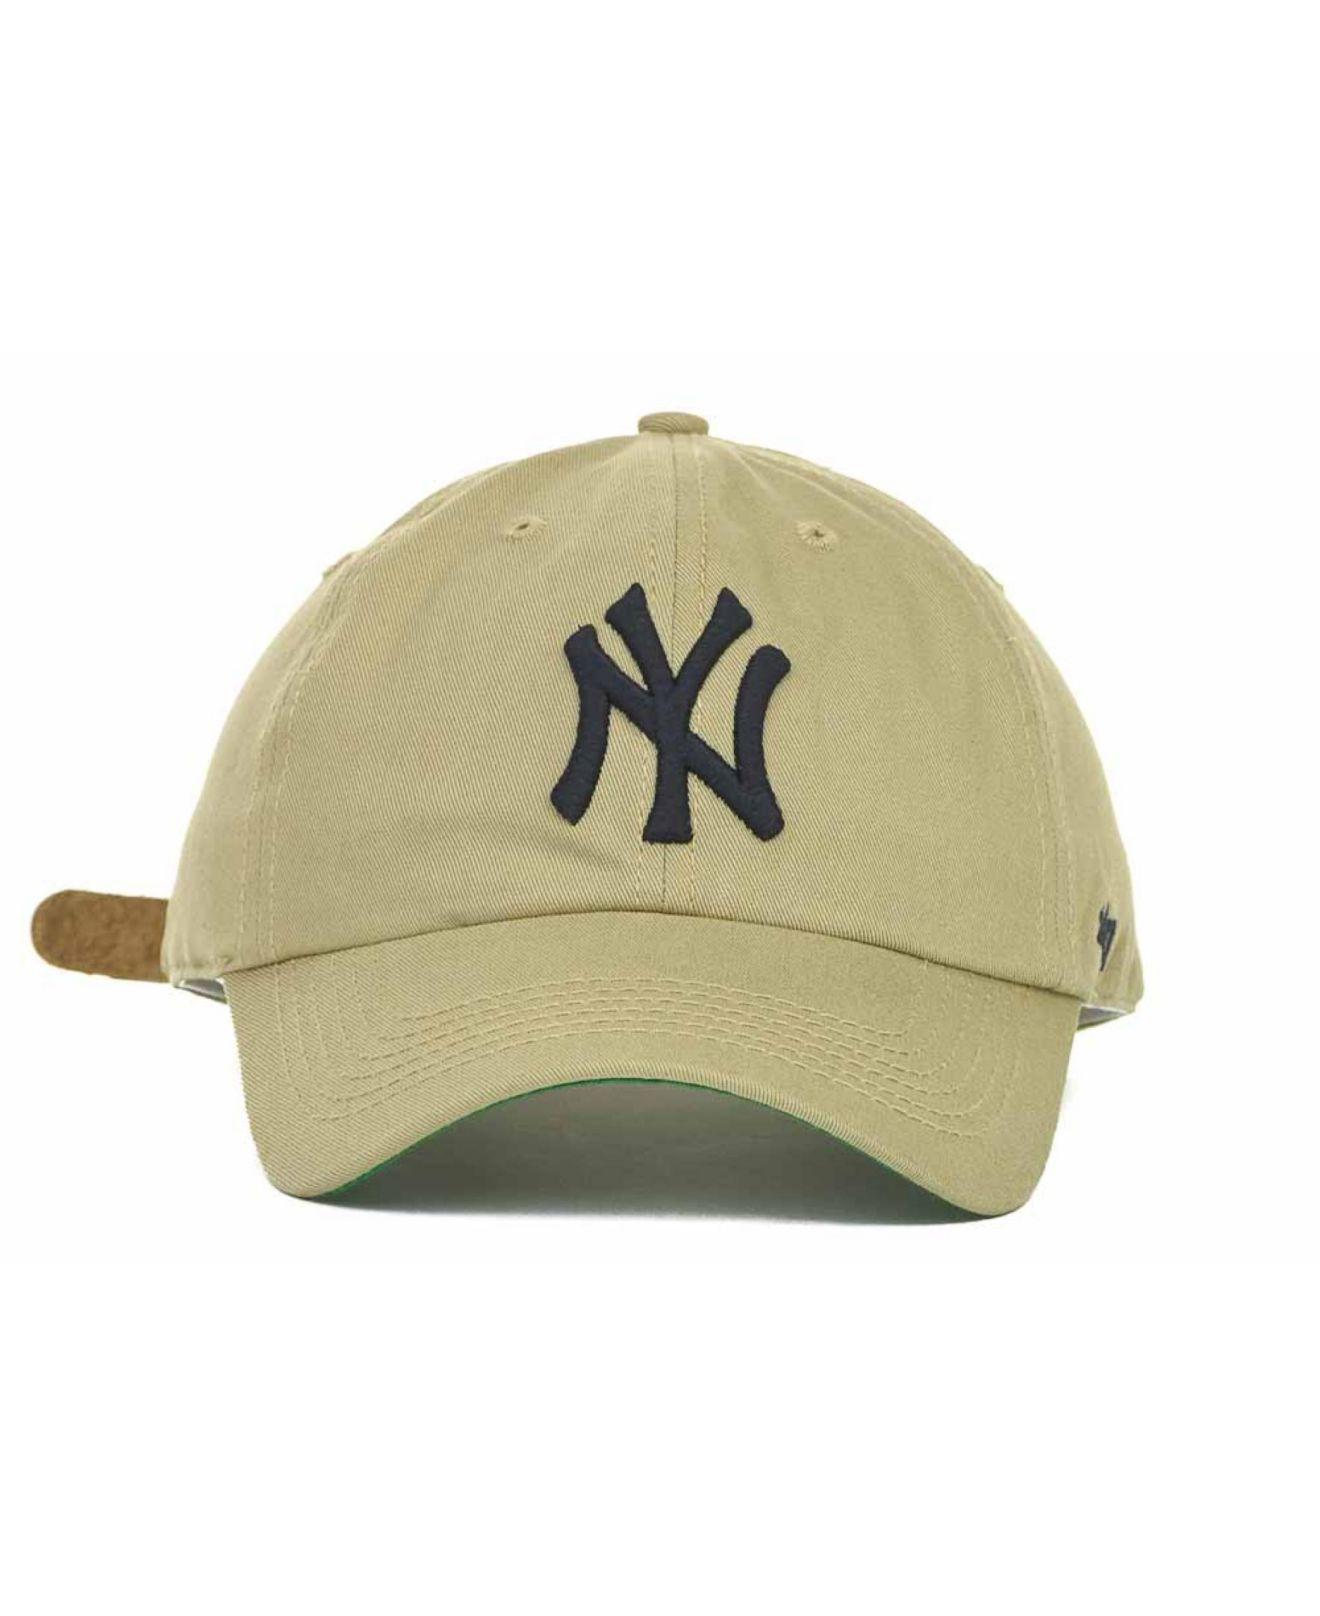 Lyst - 47 Brand New York Yankees Bergen Ii Cap in Natural for Men d8dcb76aba4